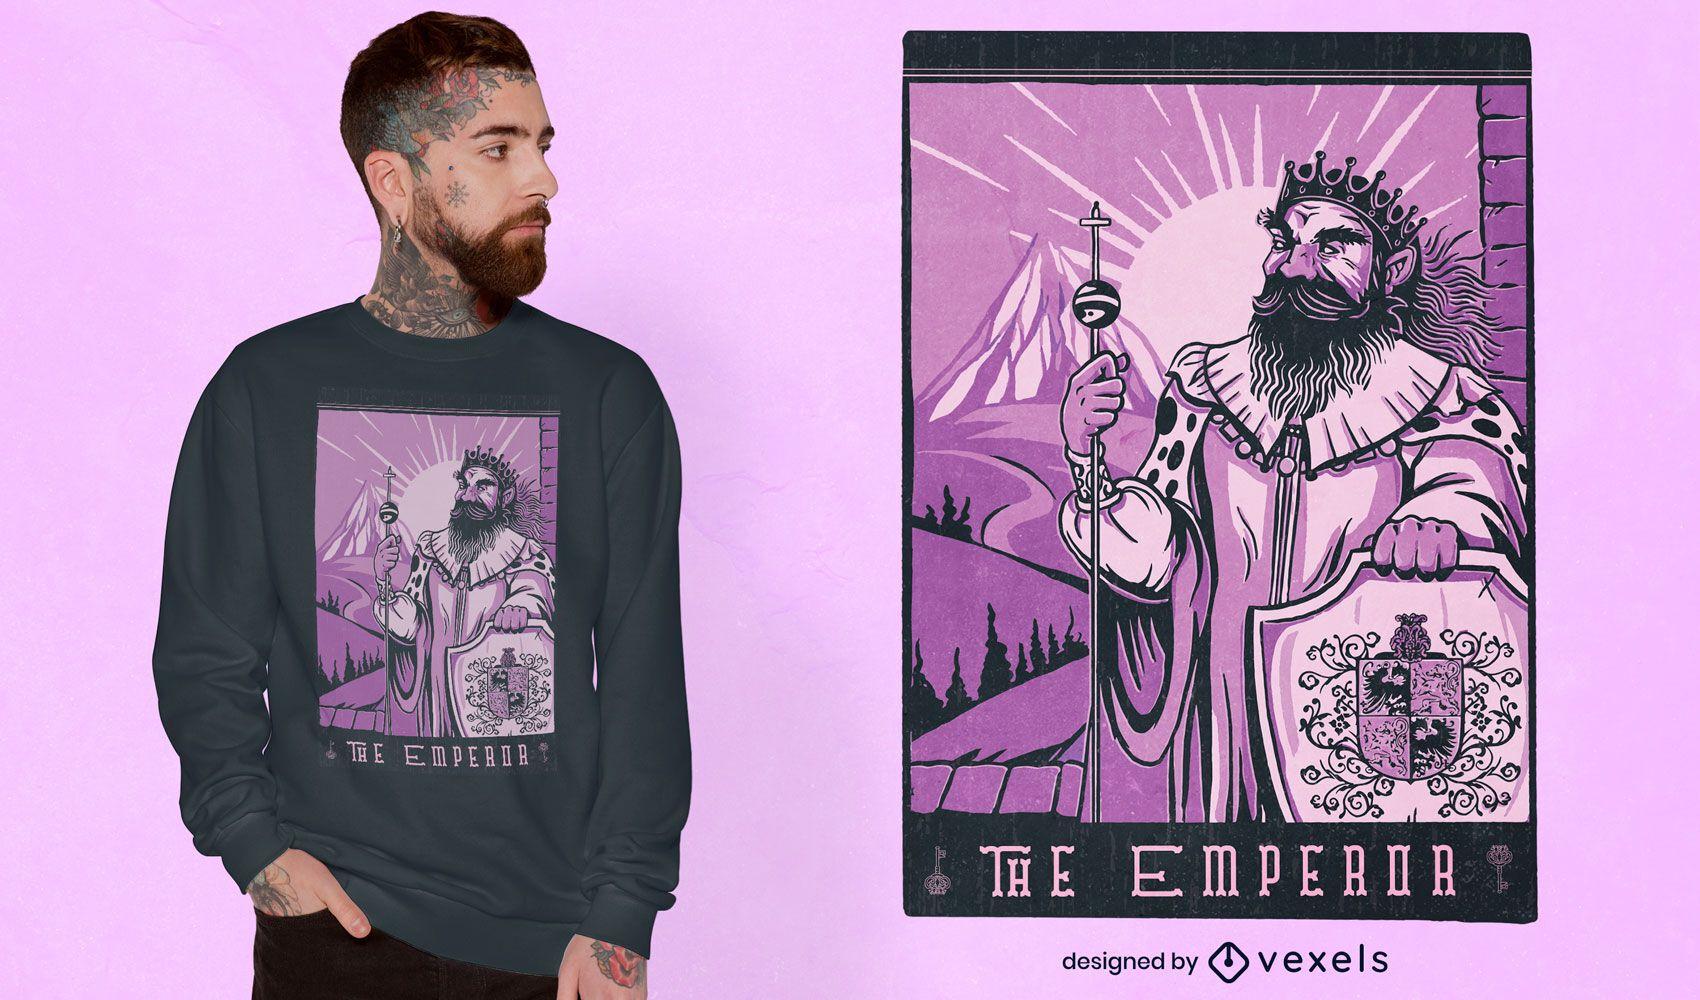 The emperor tarot t-shirt design